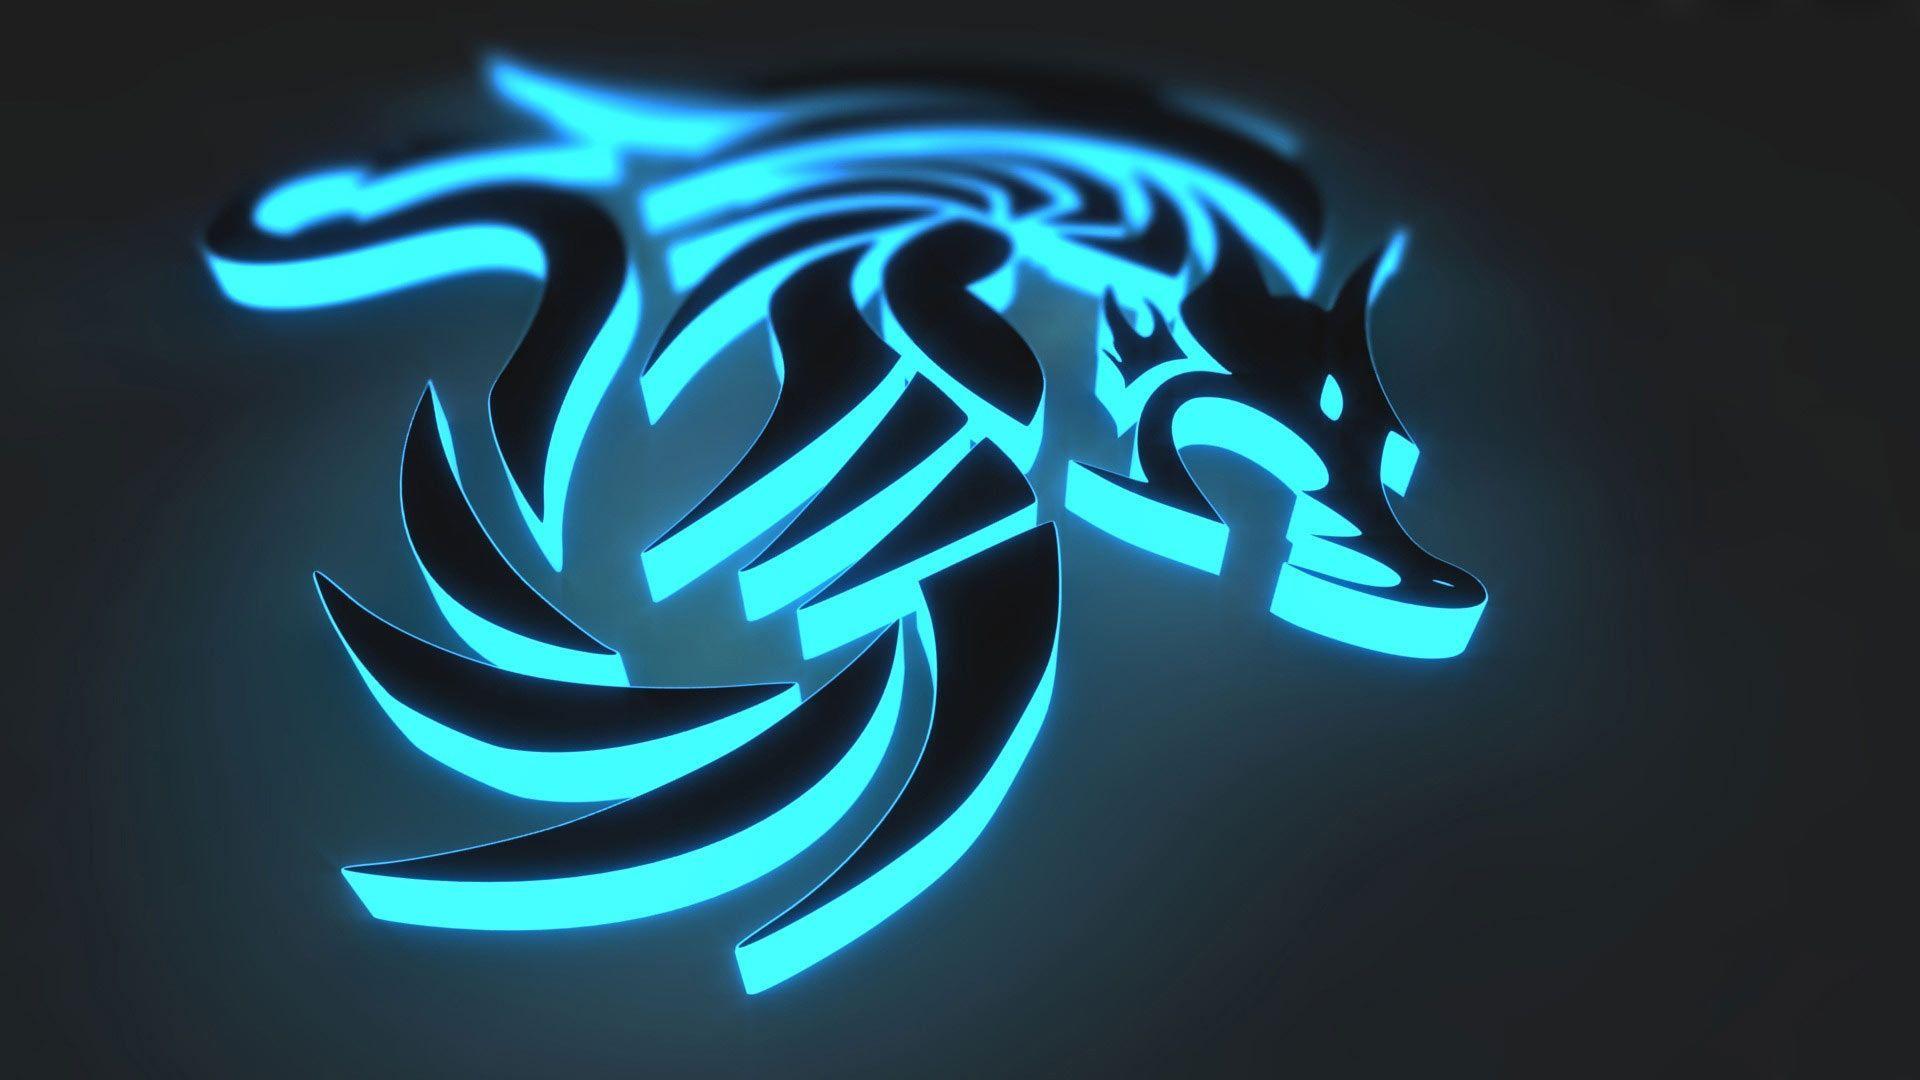 Cool Ice Dragon Logo Logodix